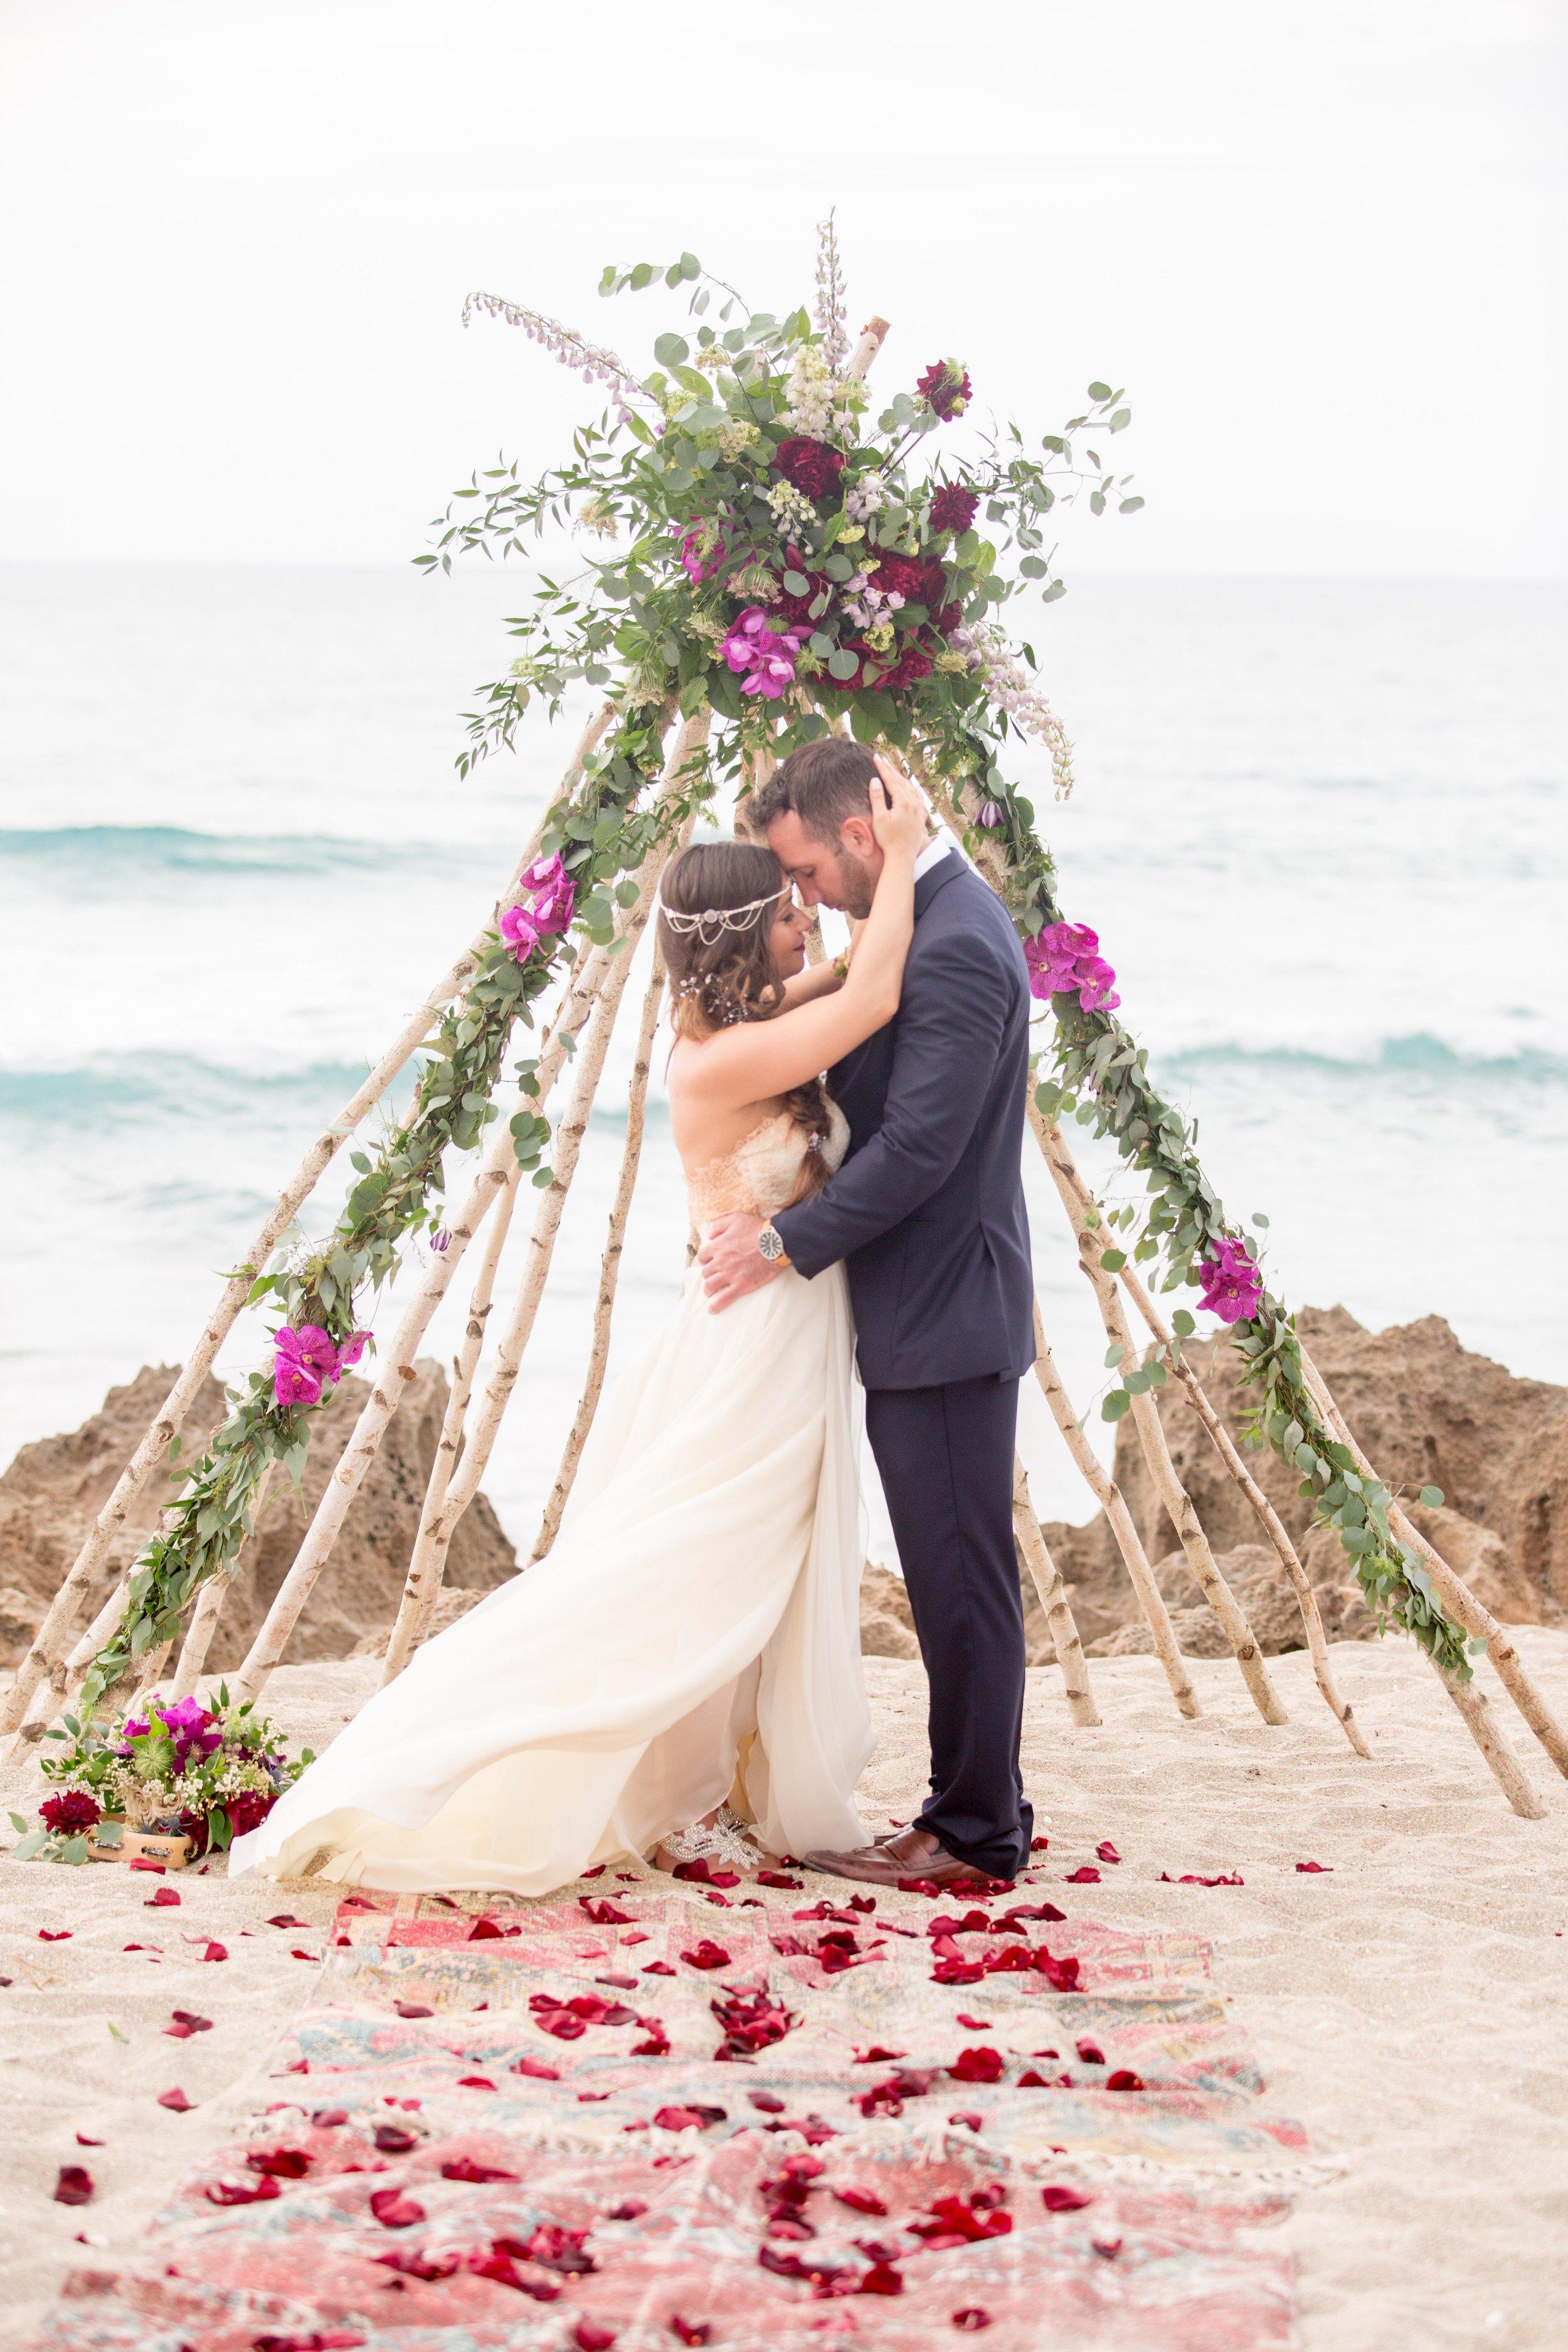 Boho bridal Accessories, Beach Bride, Champagne and GRIT - Copy.jpg